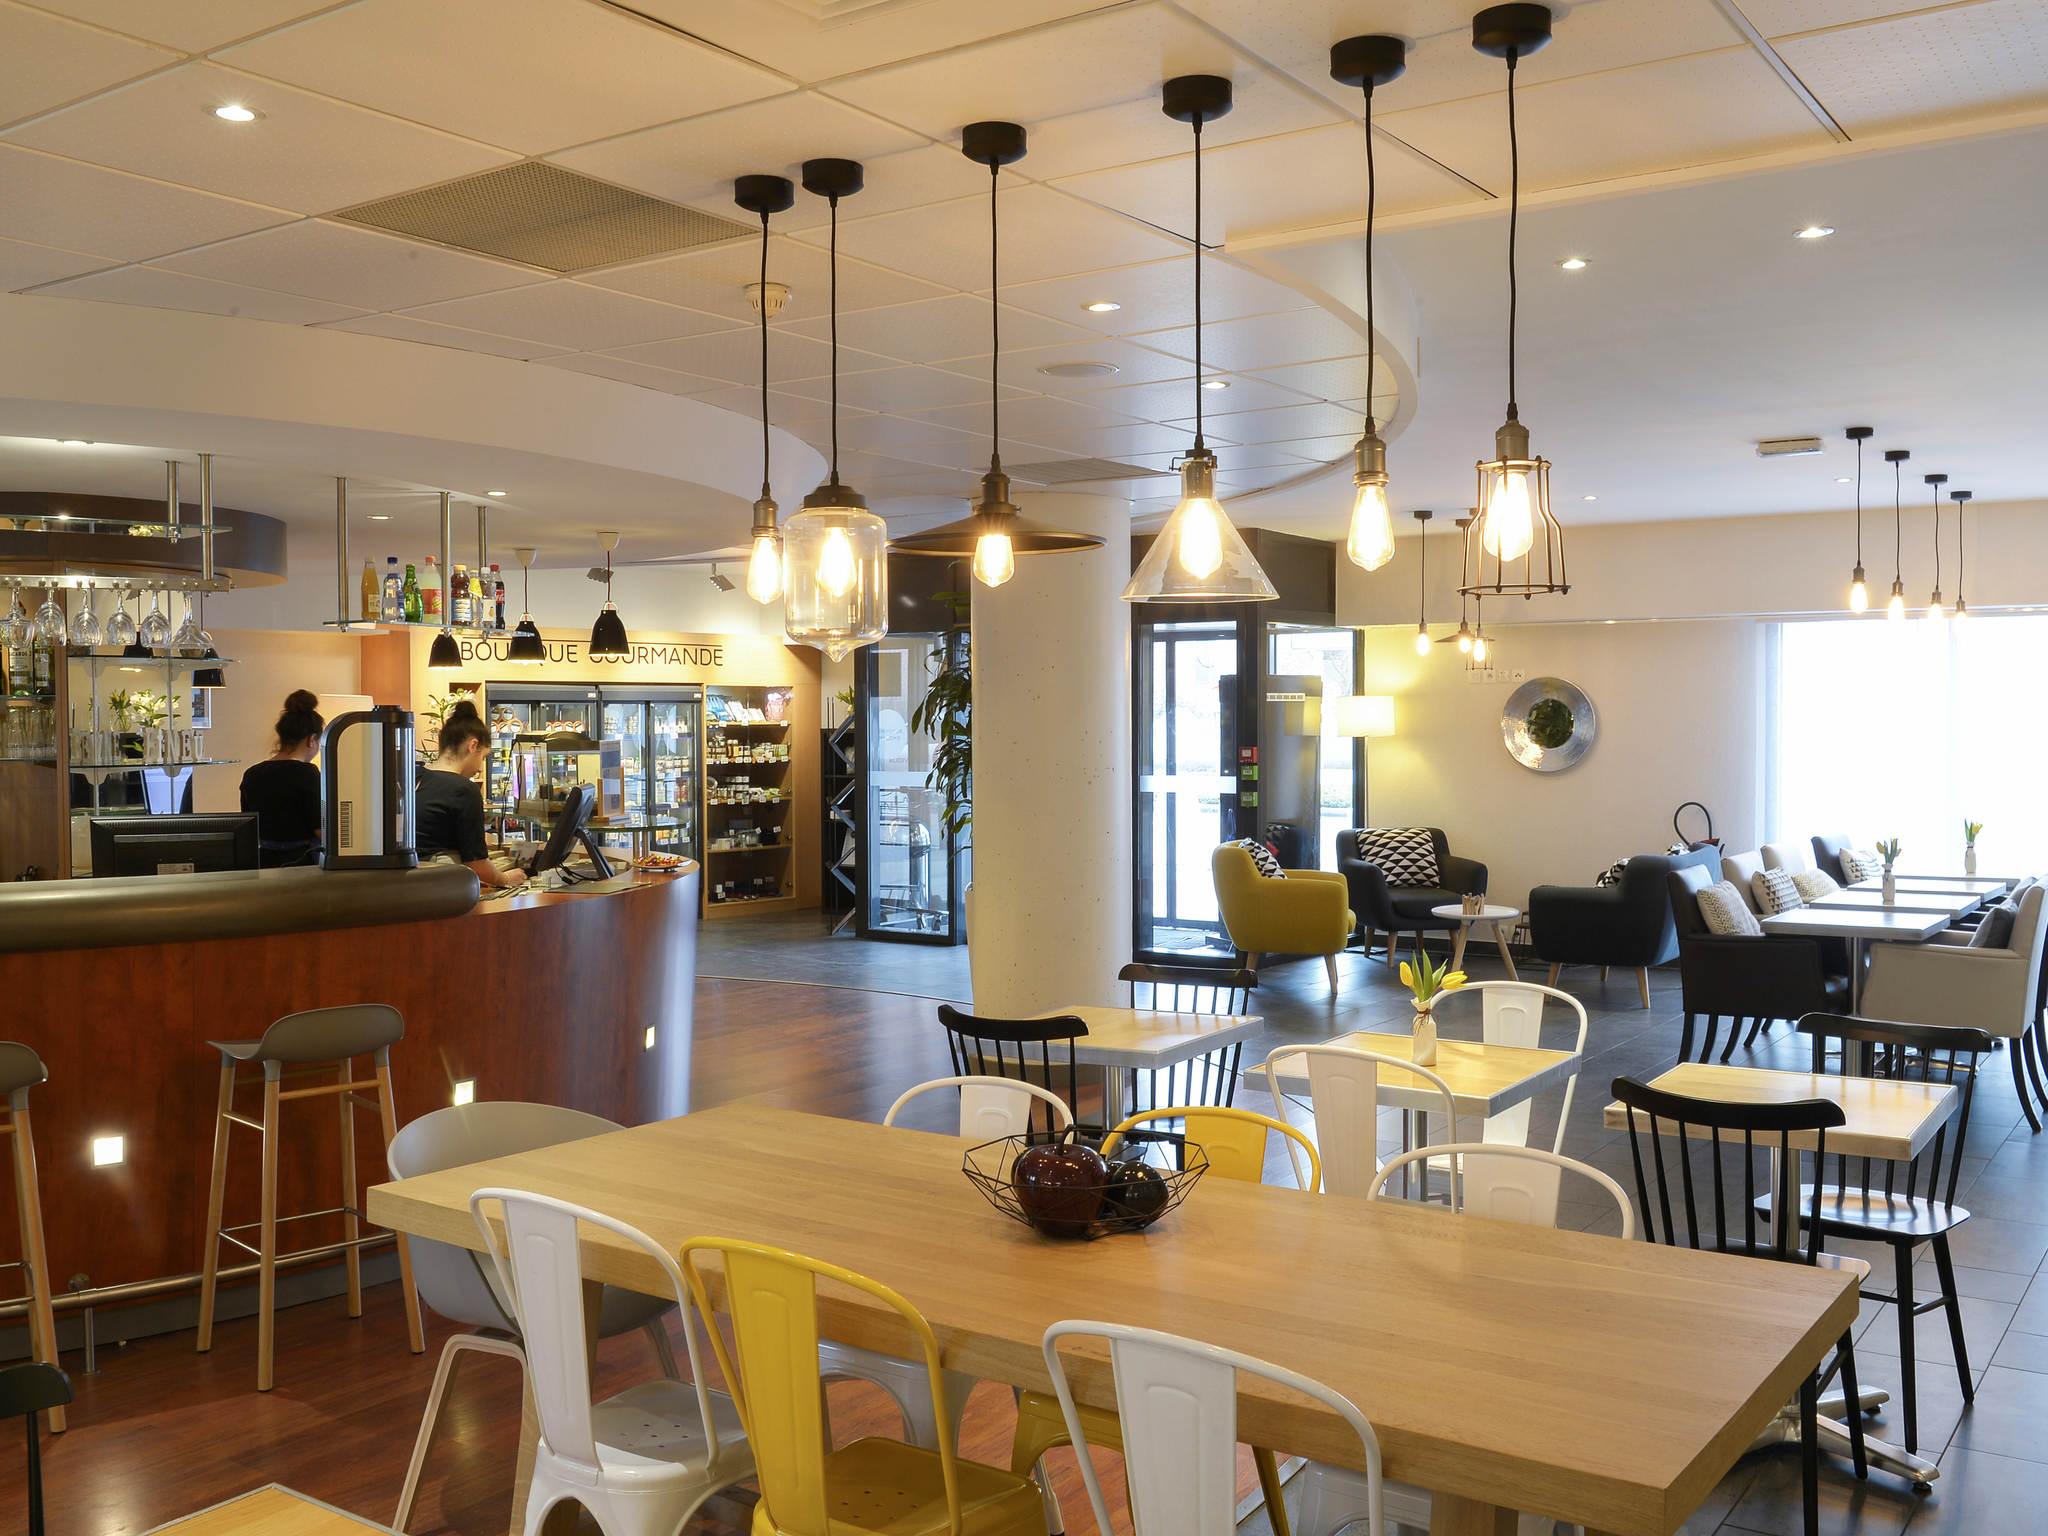 Otel – Novotel Suites Rouen Normandie